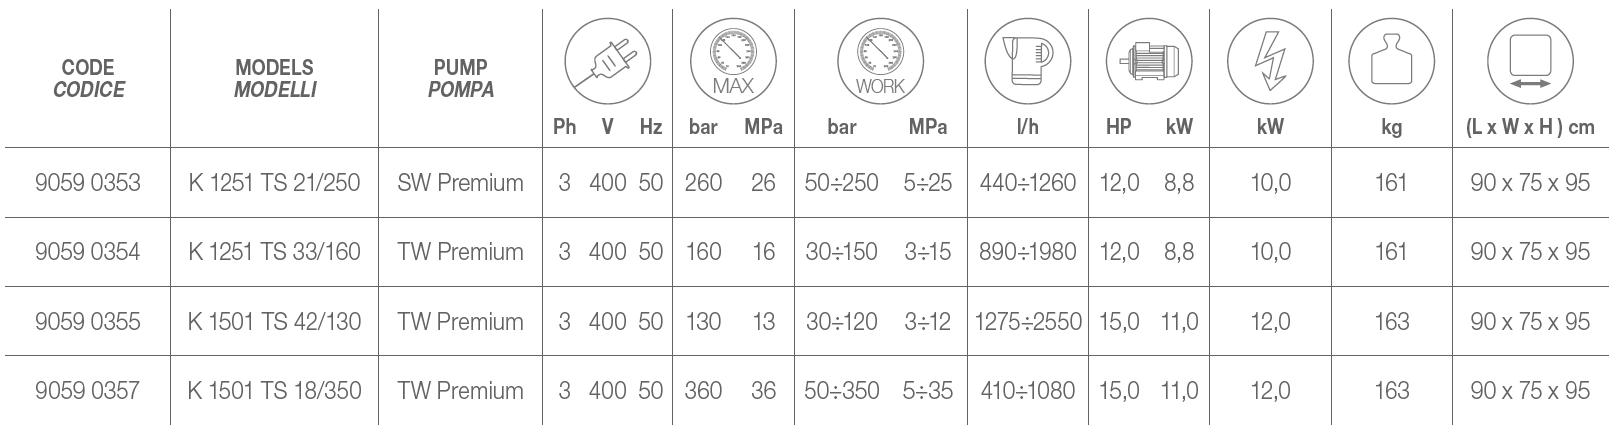 K 1251 TS Technical Data